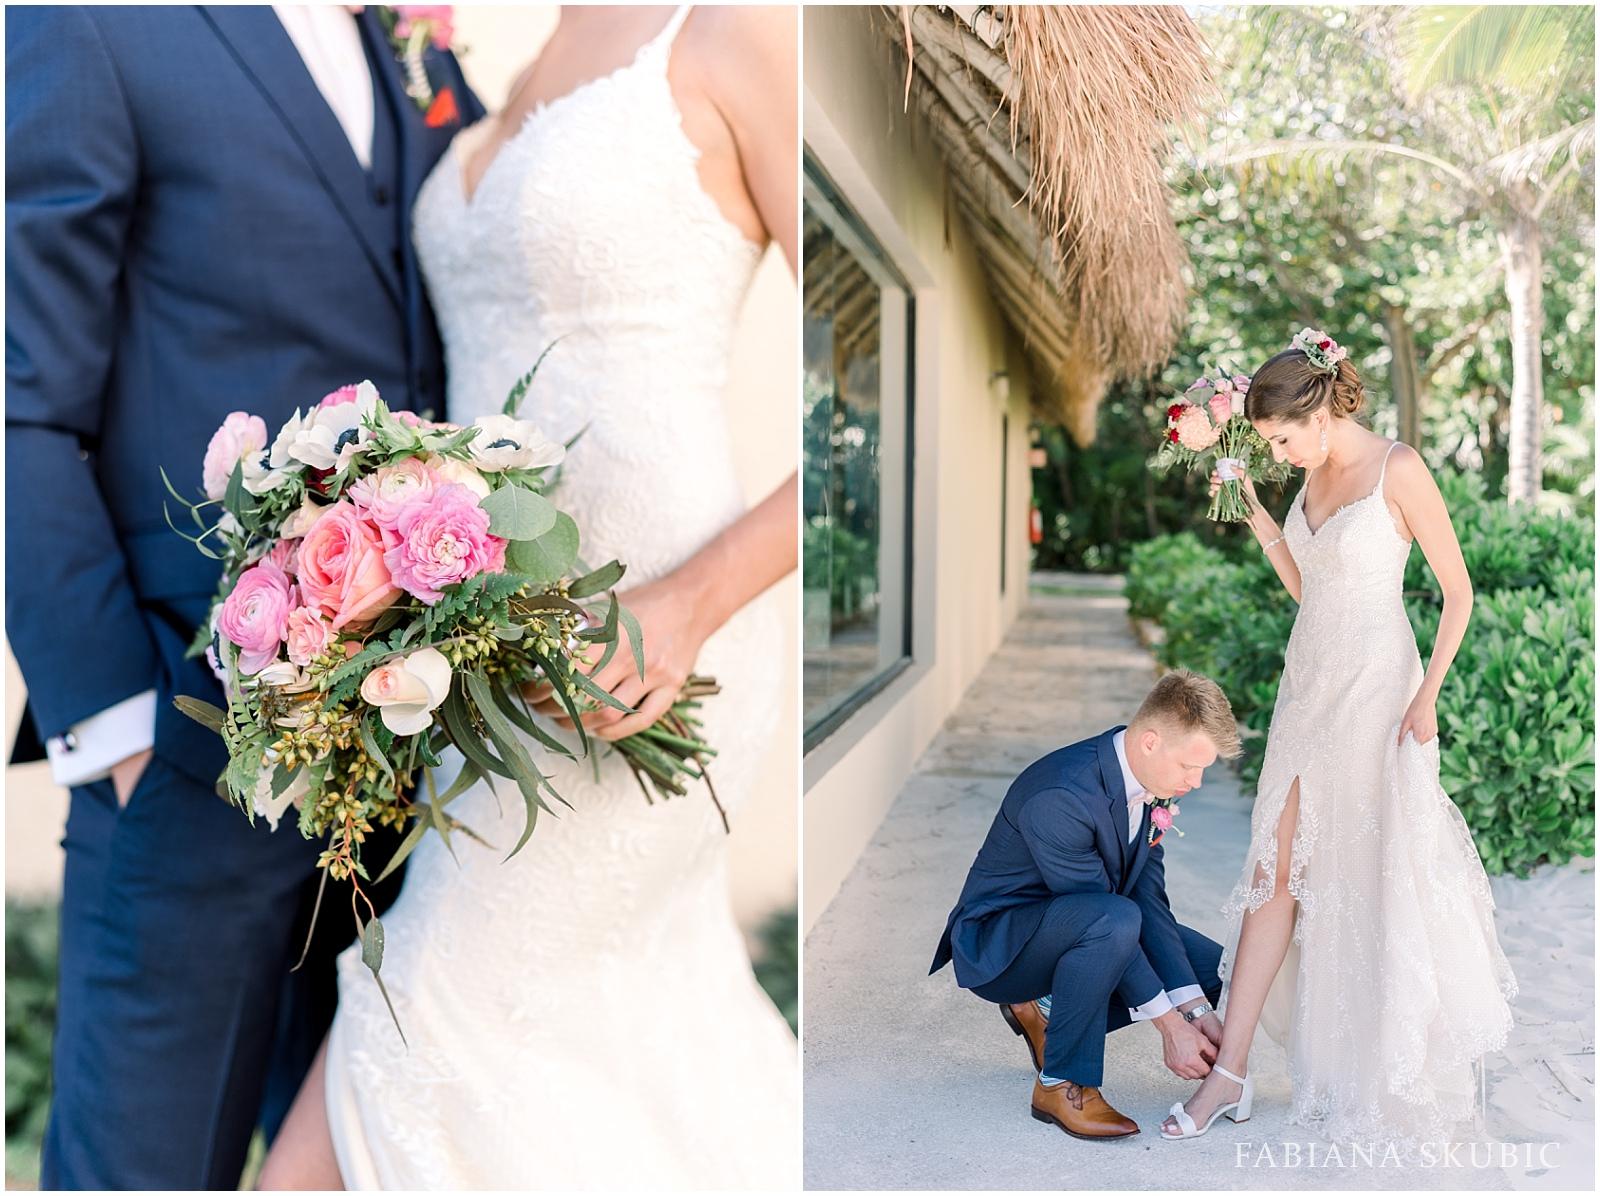 TJ_Now_Sapphire_Riviera_Cancun_Mexico_Wedding_Photos_0197.jpg